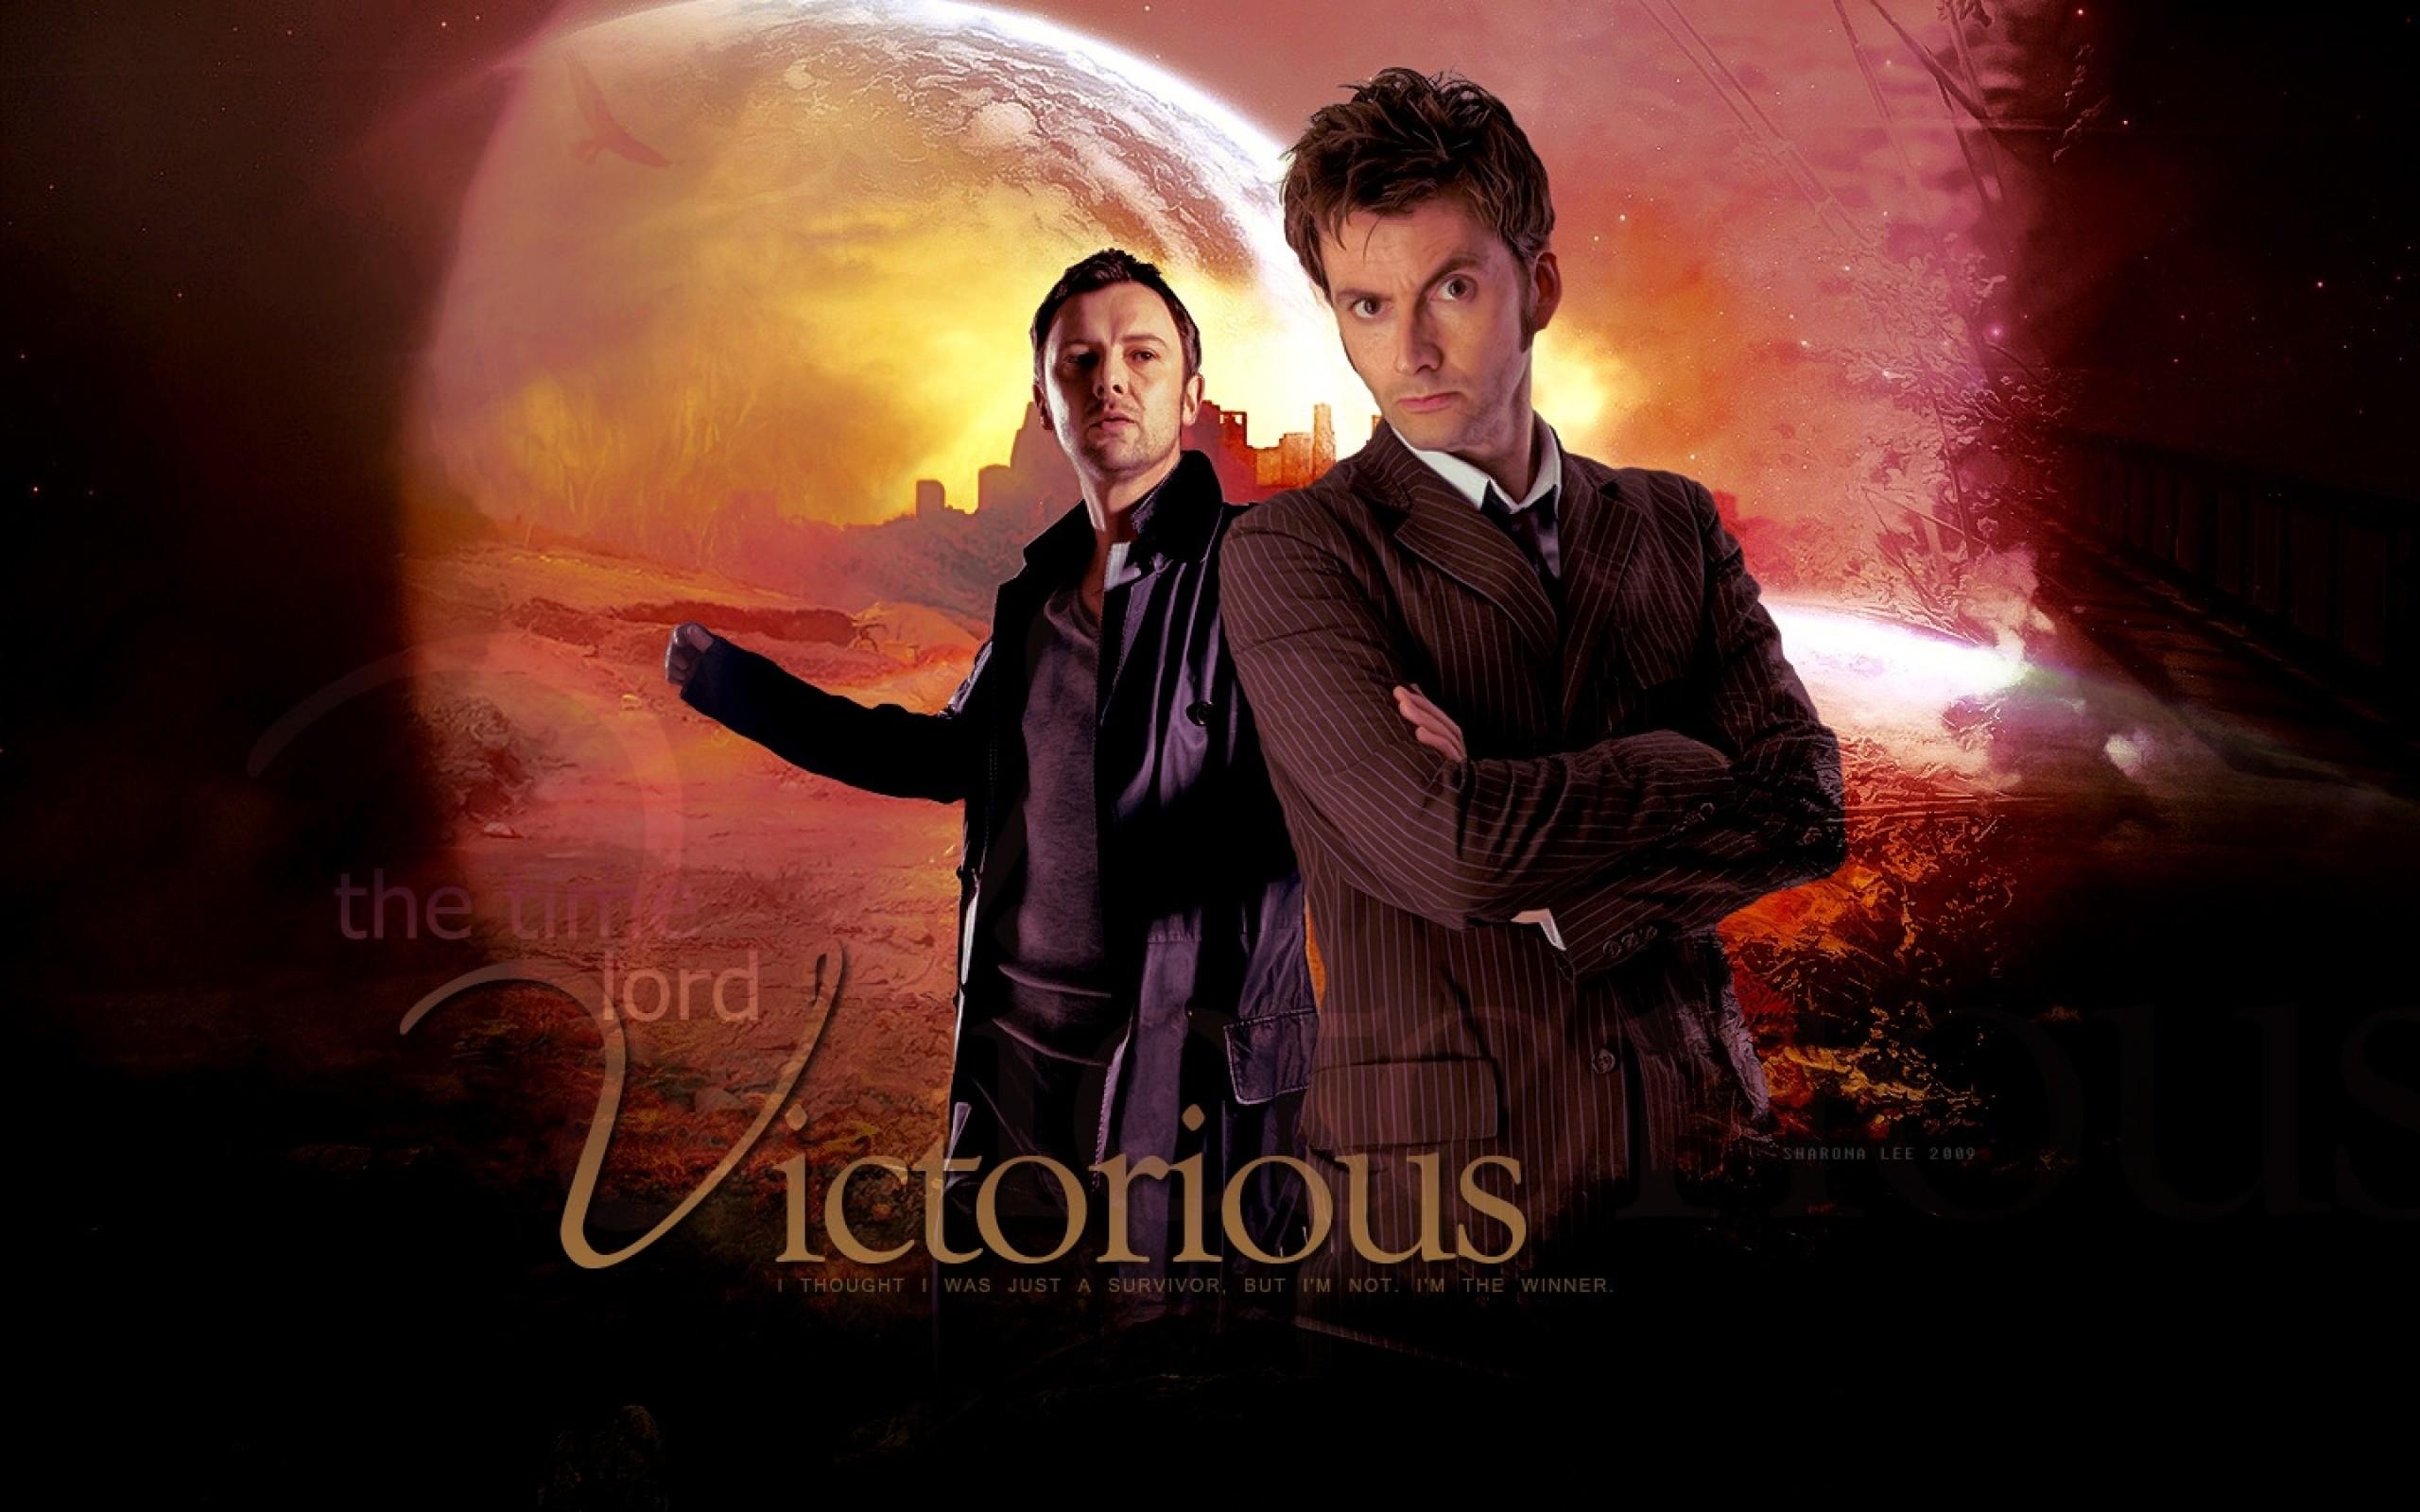 david tennant bbc the master doctor who john simm tenth doctor 1440×900  wallpaper Art HD Wallpaper